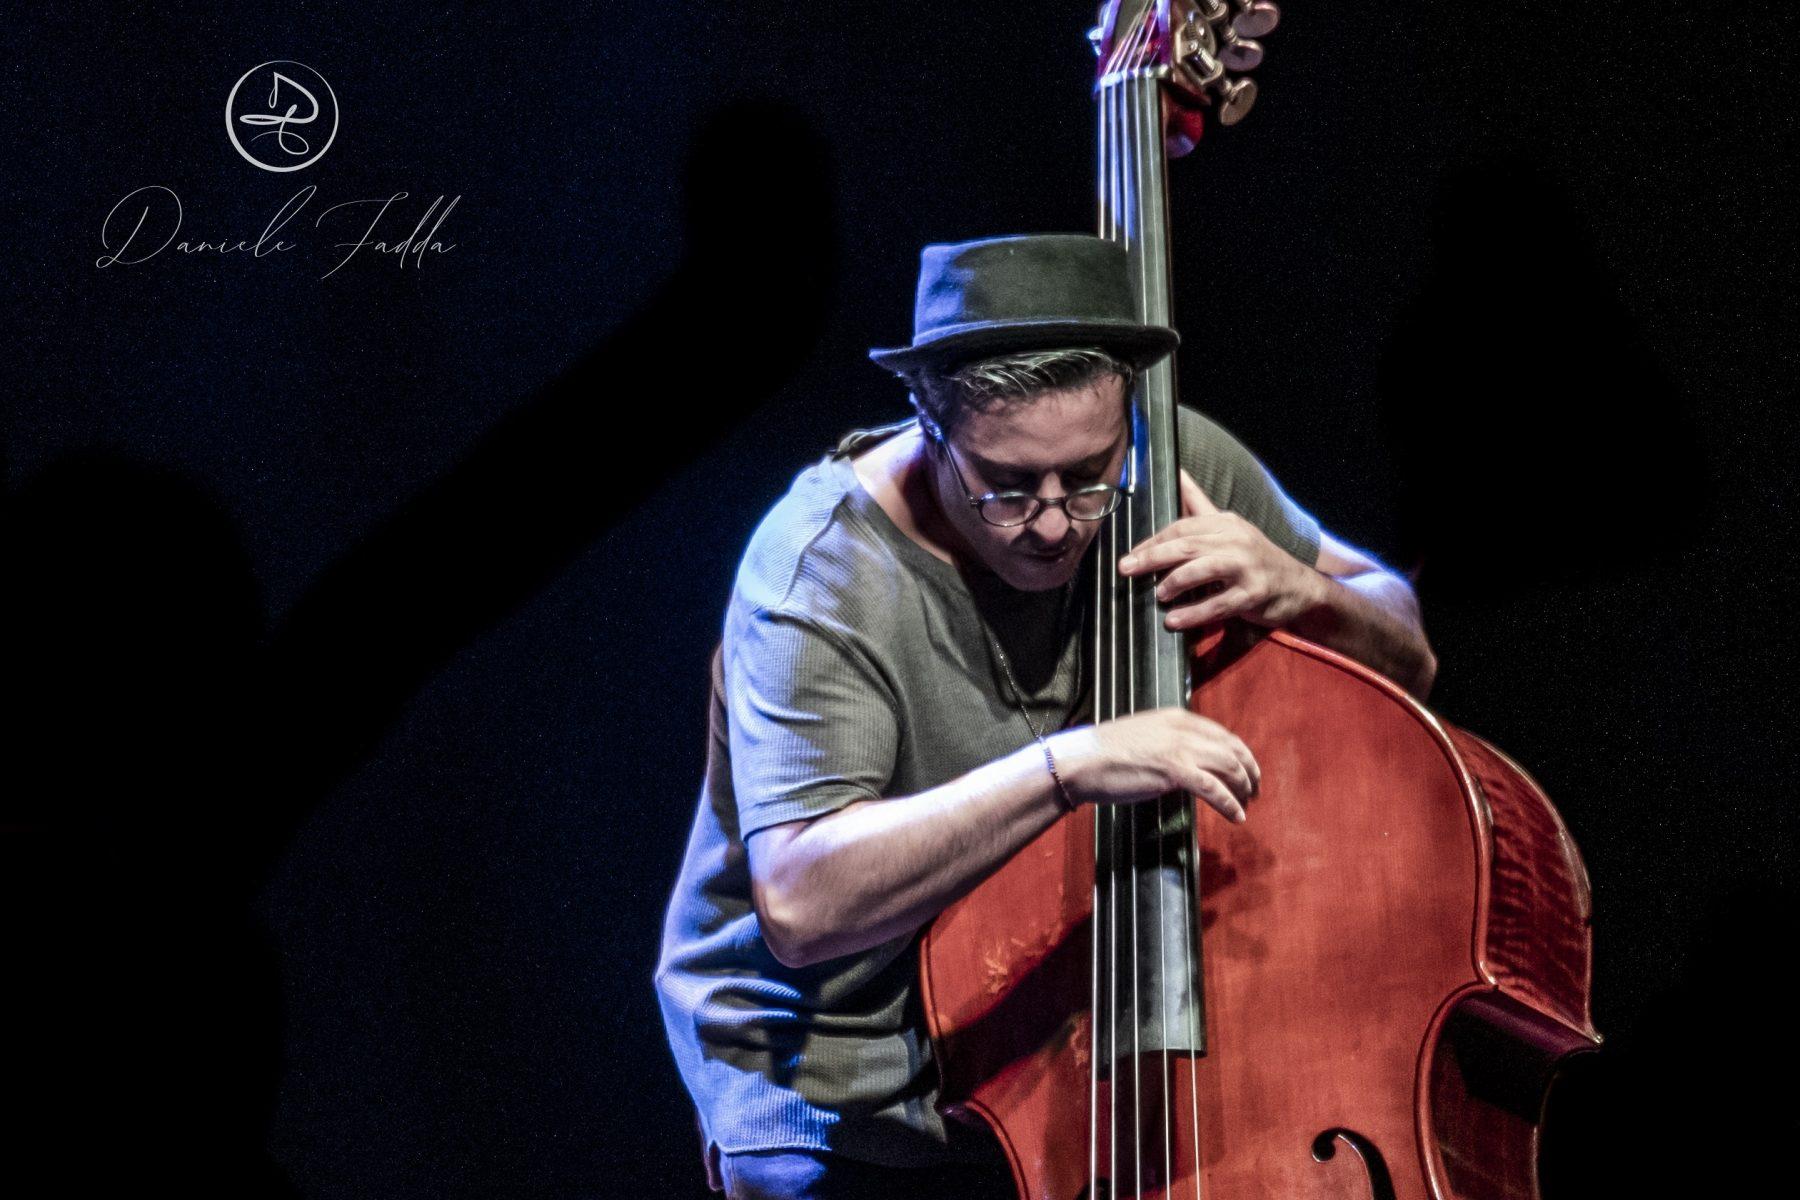 European Jazz Expo - Adam Ben Ezra - Daniele Fadda - 2019 - Sa Scena Sarda